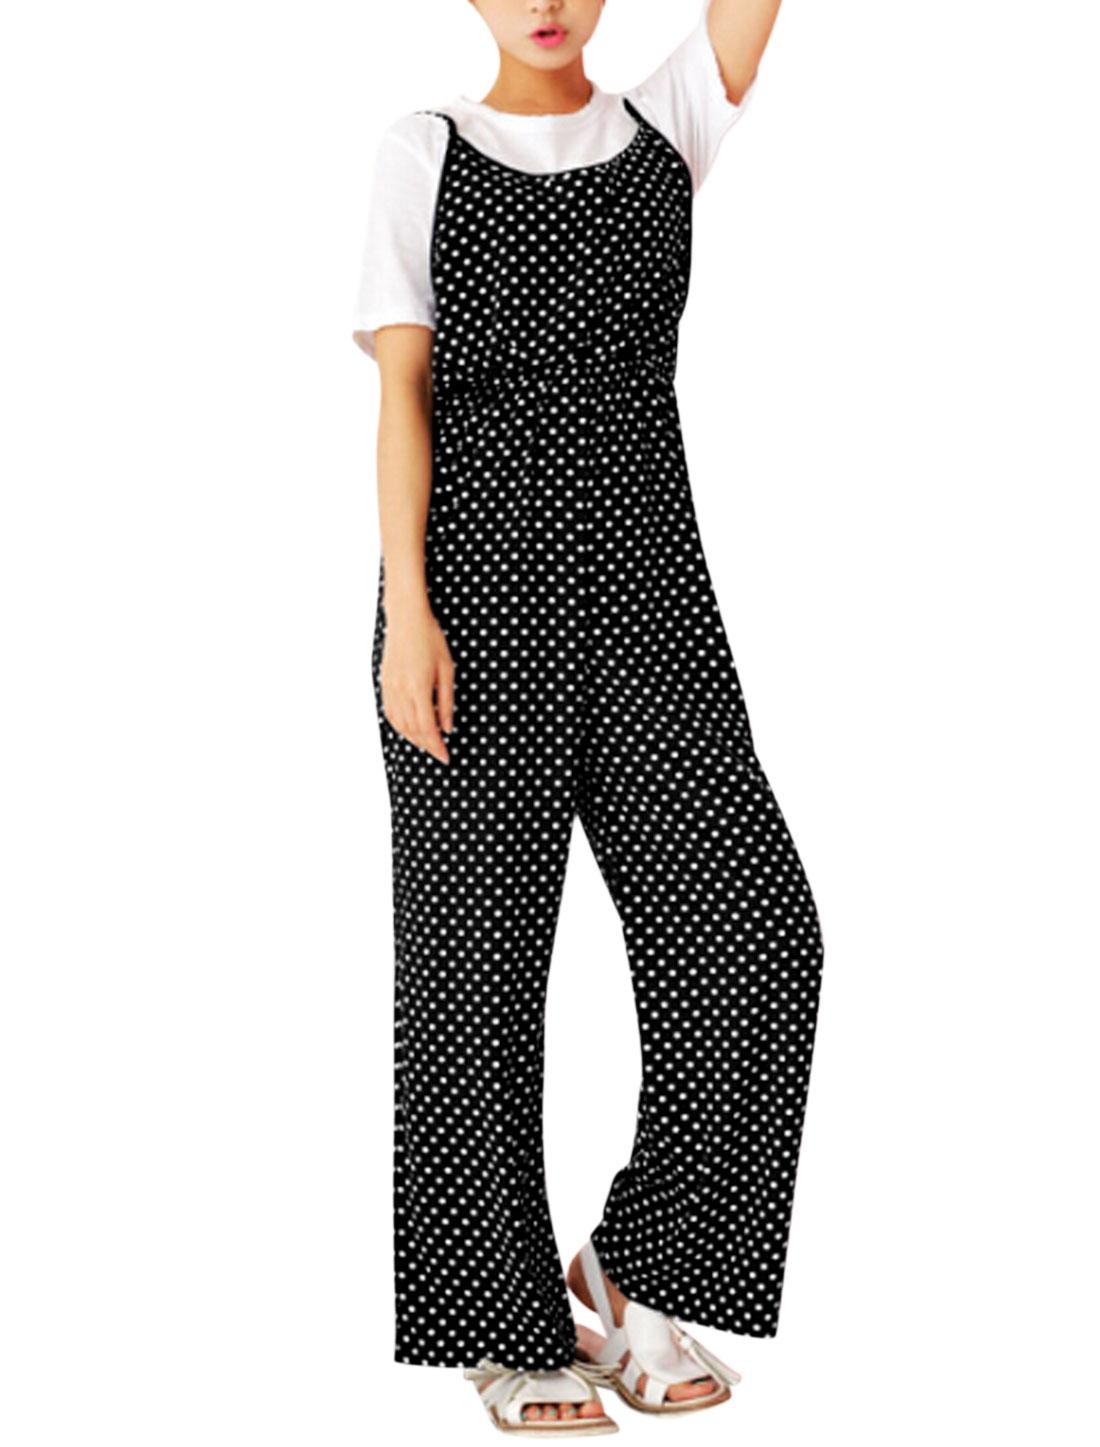 Woman Polka Dots Prints Spaghetti Straps Elastic Waist Jumpsuit Black S